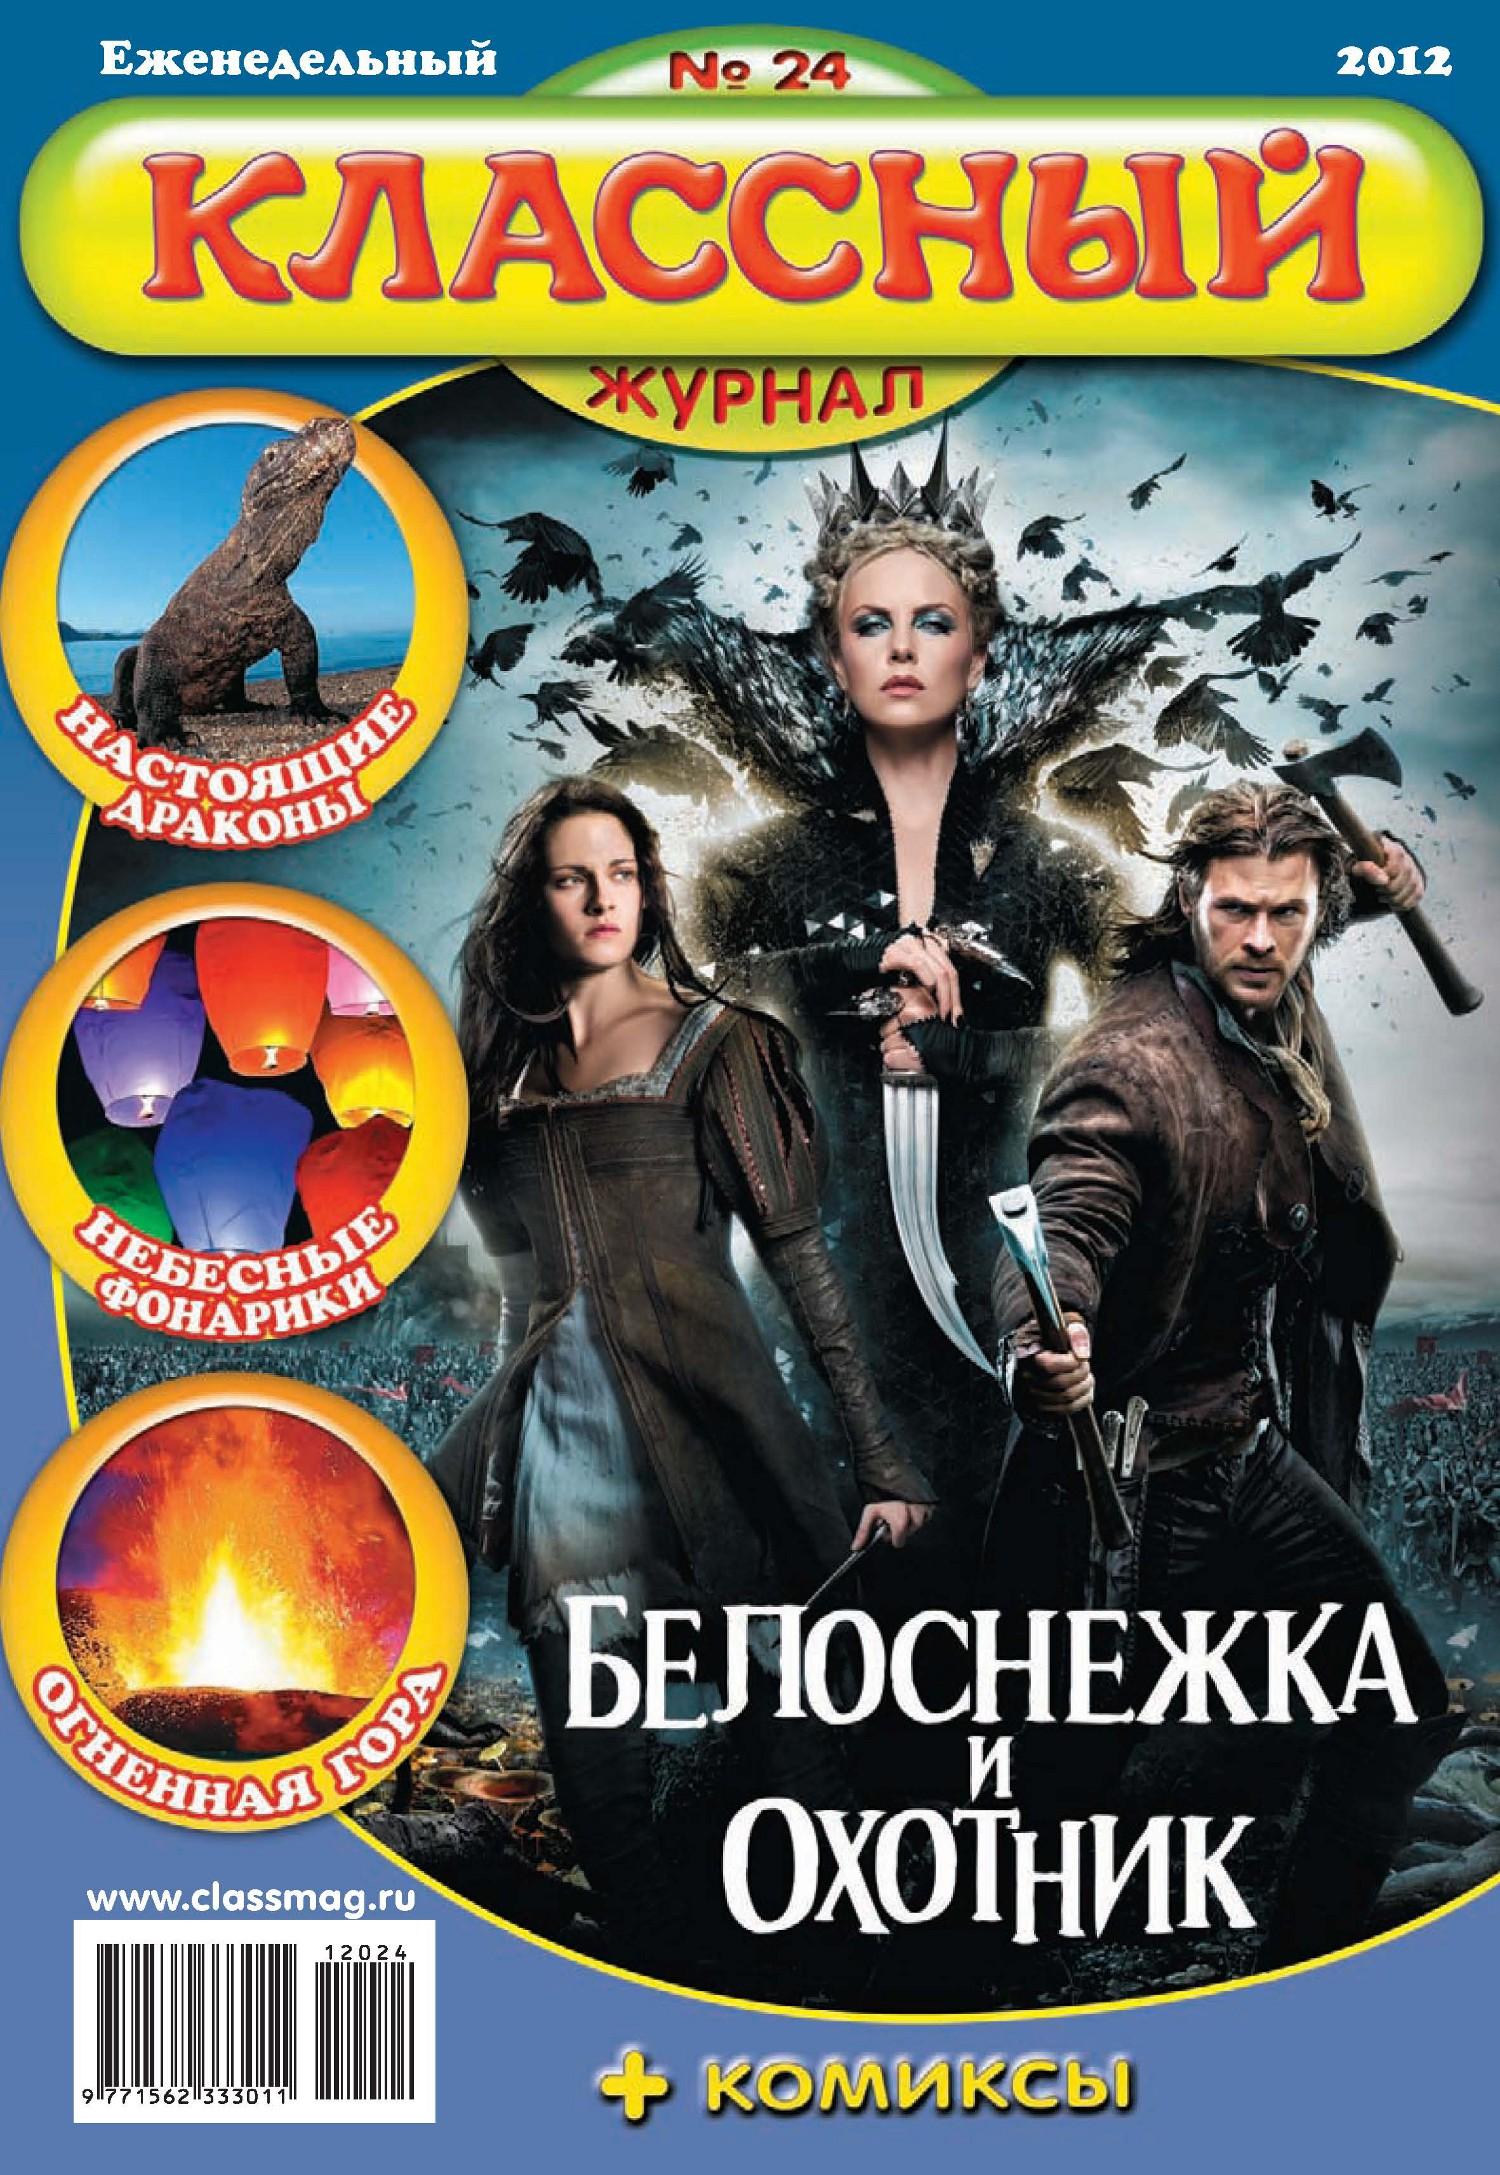 Классный журнал №24/2012